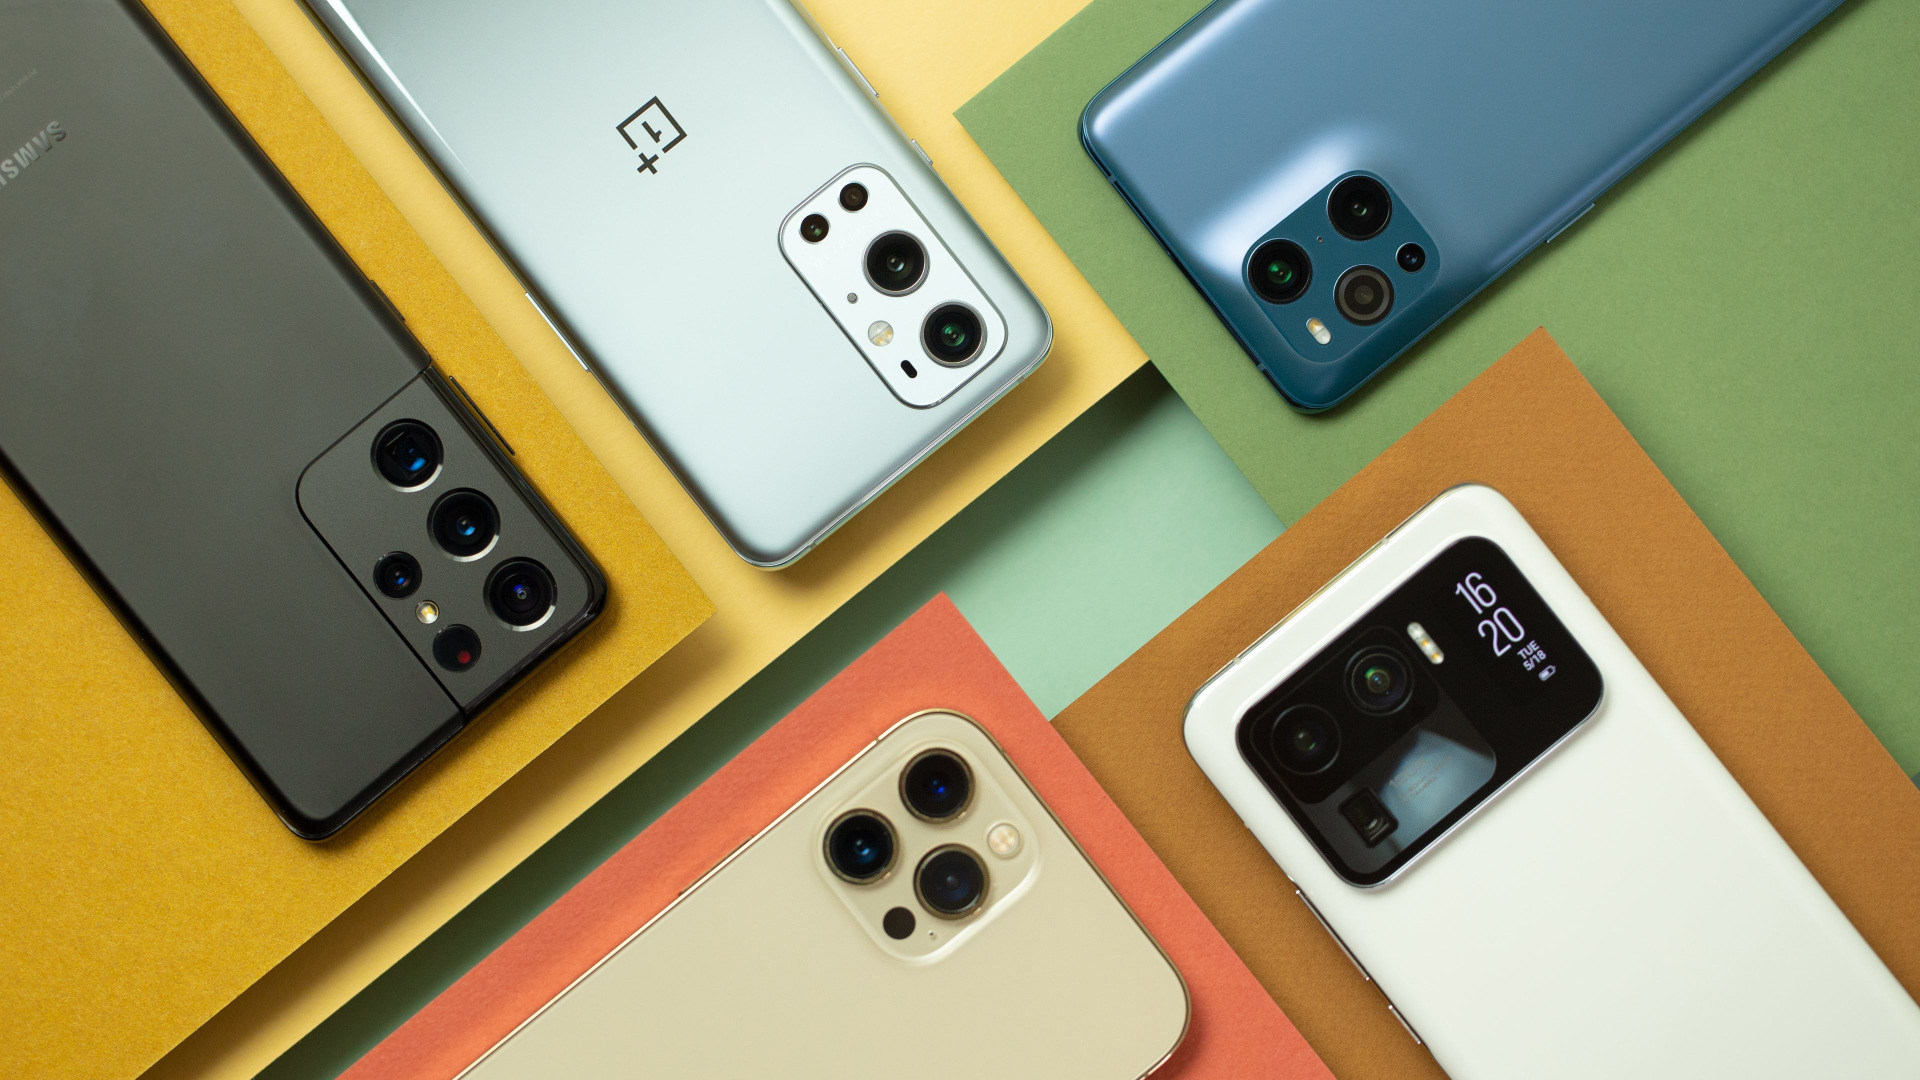 Smartphone, Smartphones, Handy, Vergleich, Handys, Samsung Galaxy S21 Ultra, OnePlus 9 Pro, Oppo Find X3 Pro, Xiaomi Mi 11 Ultra, Apple iPhone 12 Max